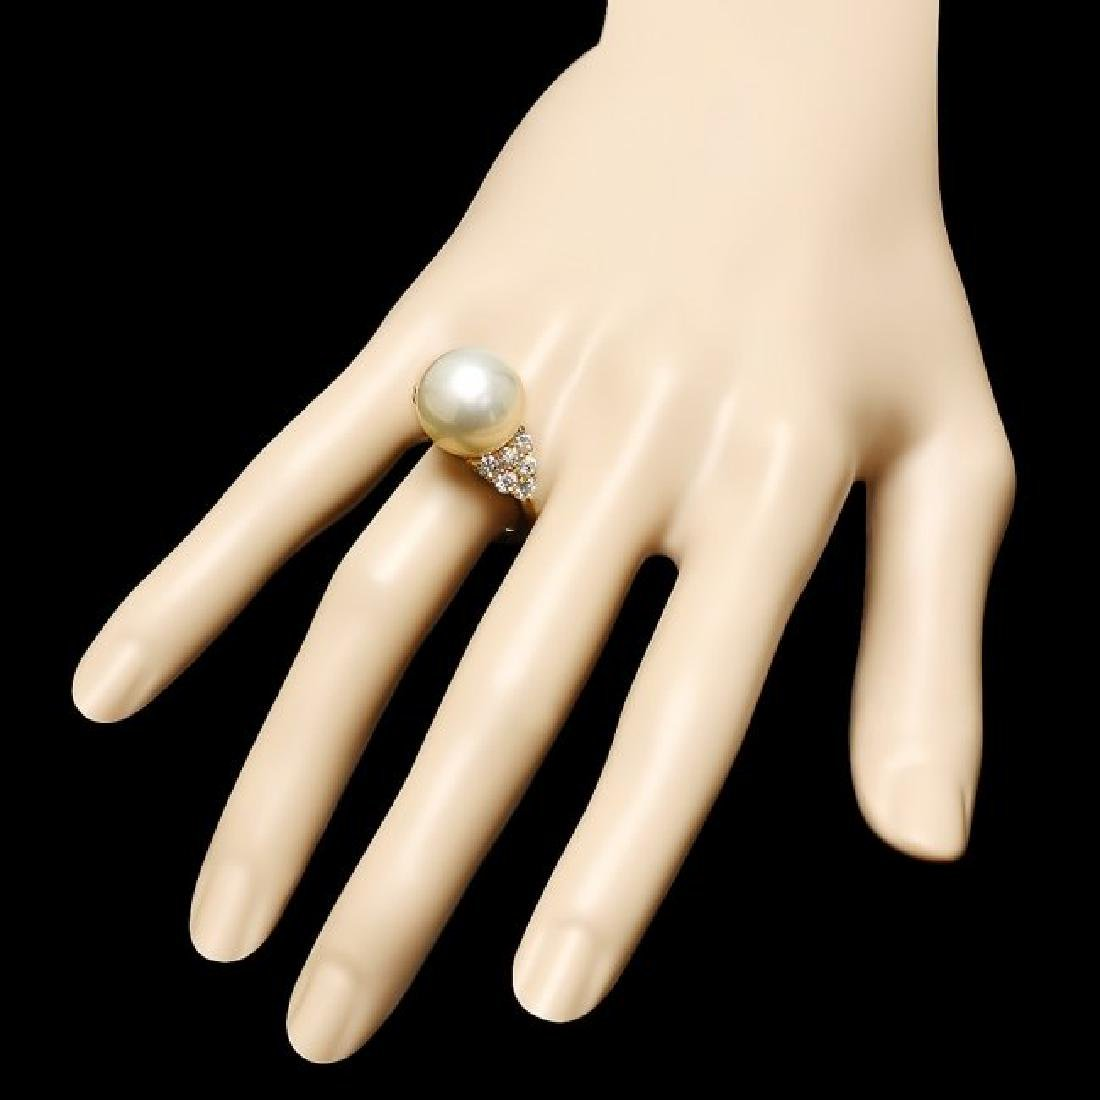 14k Gold 14 X 14mm Pearl 1.15ct Diamond Ring - 3